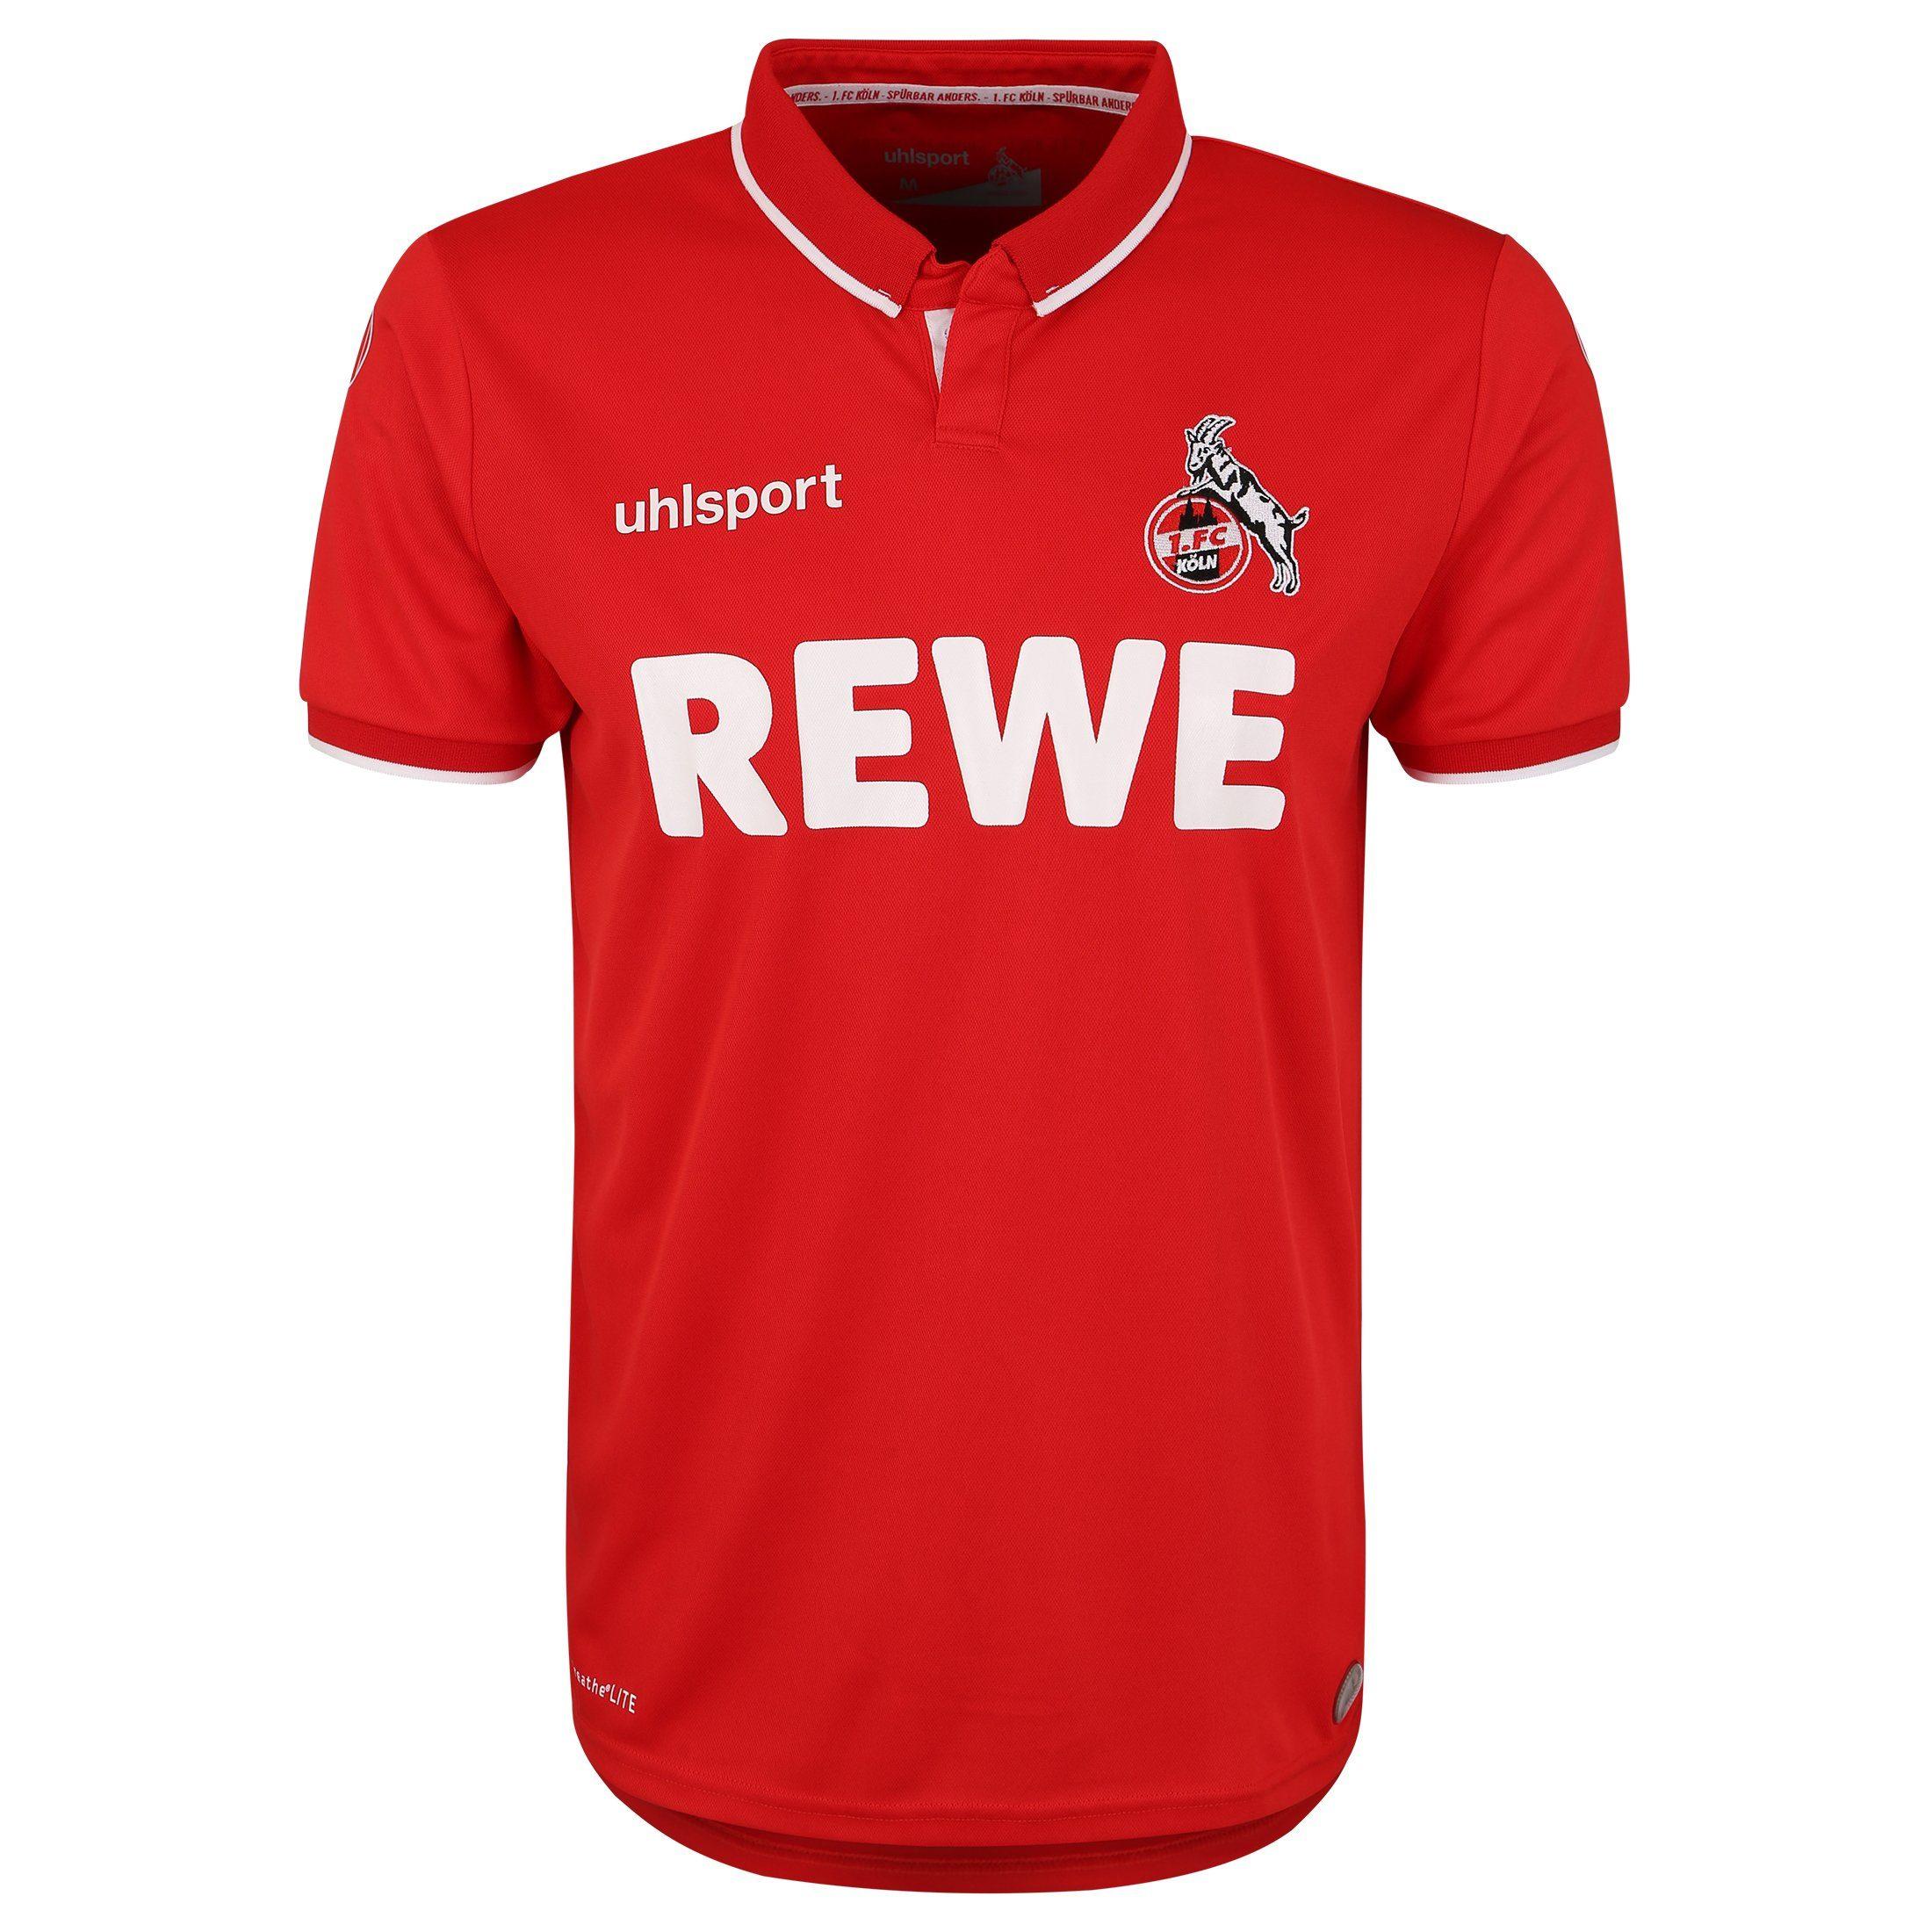 Uhlsport Fußballtrikot 1 Fc Köln 18/19 Auswärts | Sportbekleidung > Trikots > Sonstige Trikots | Rot | Uhlsport